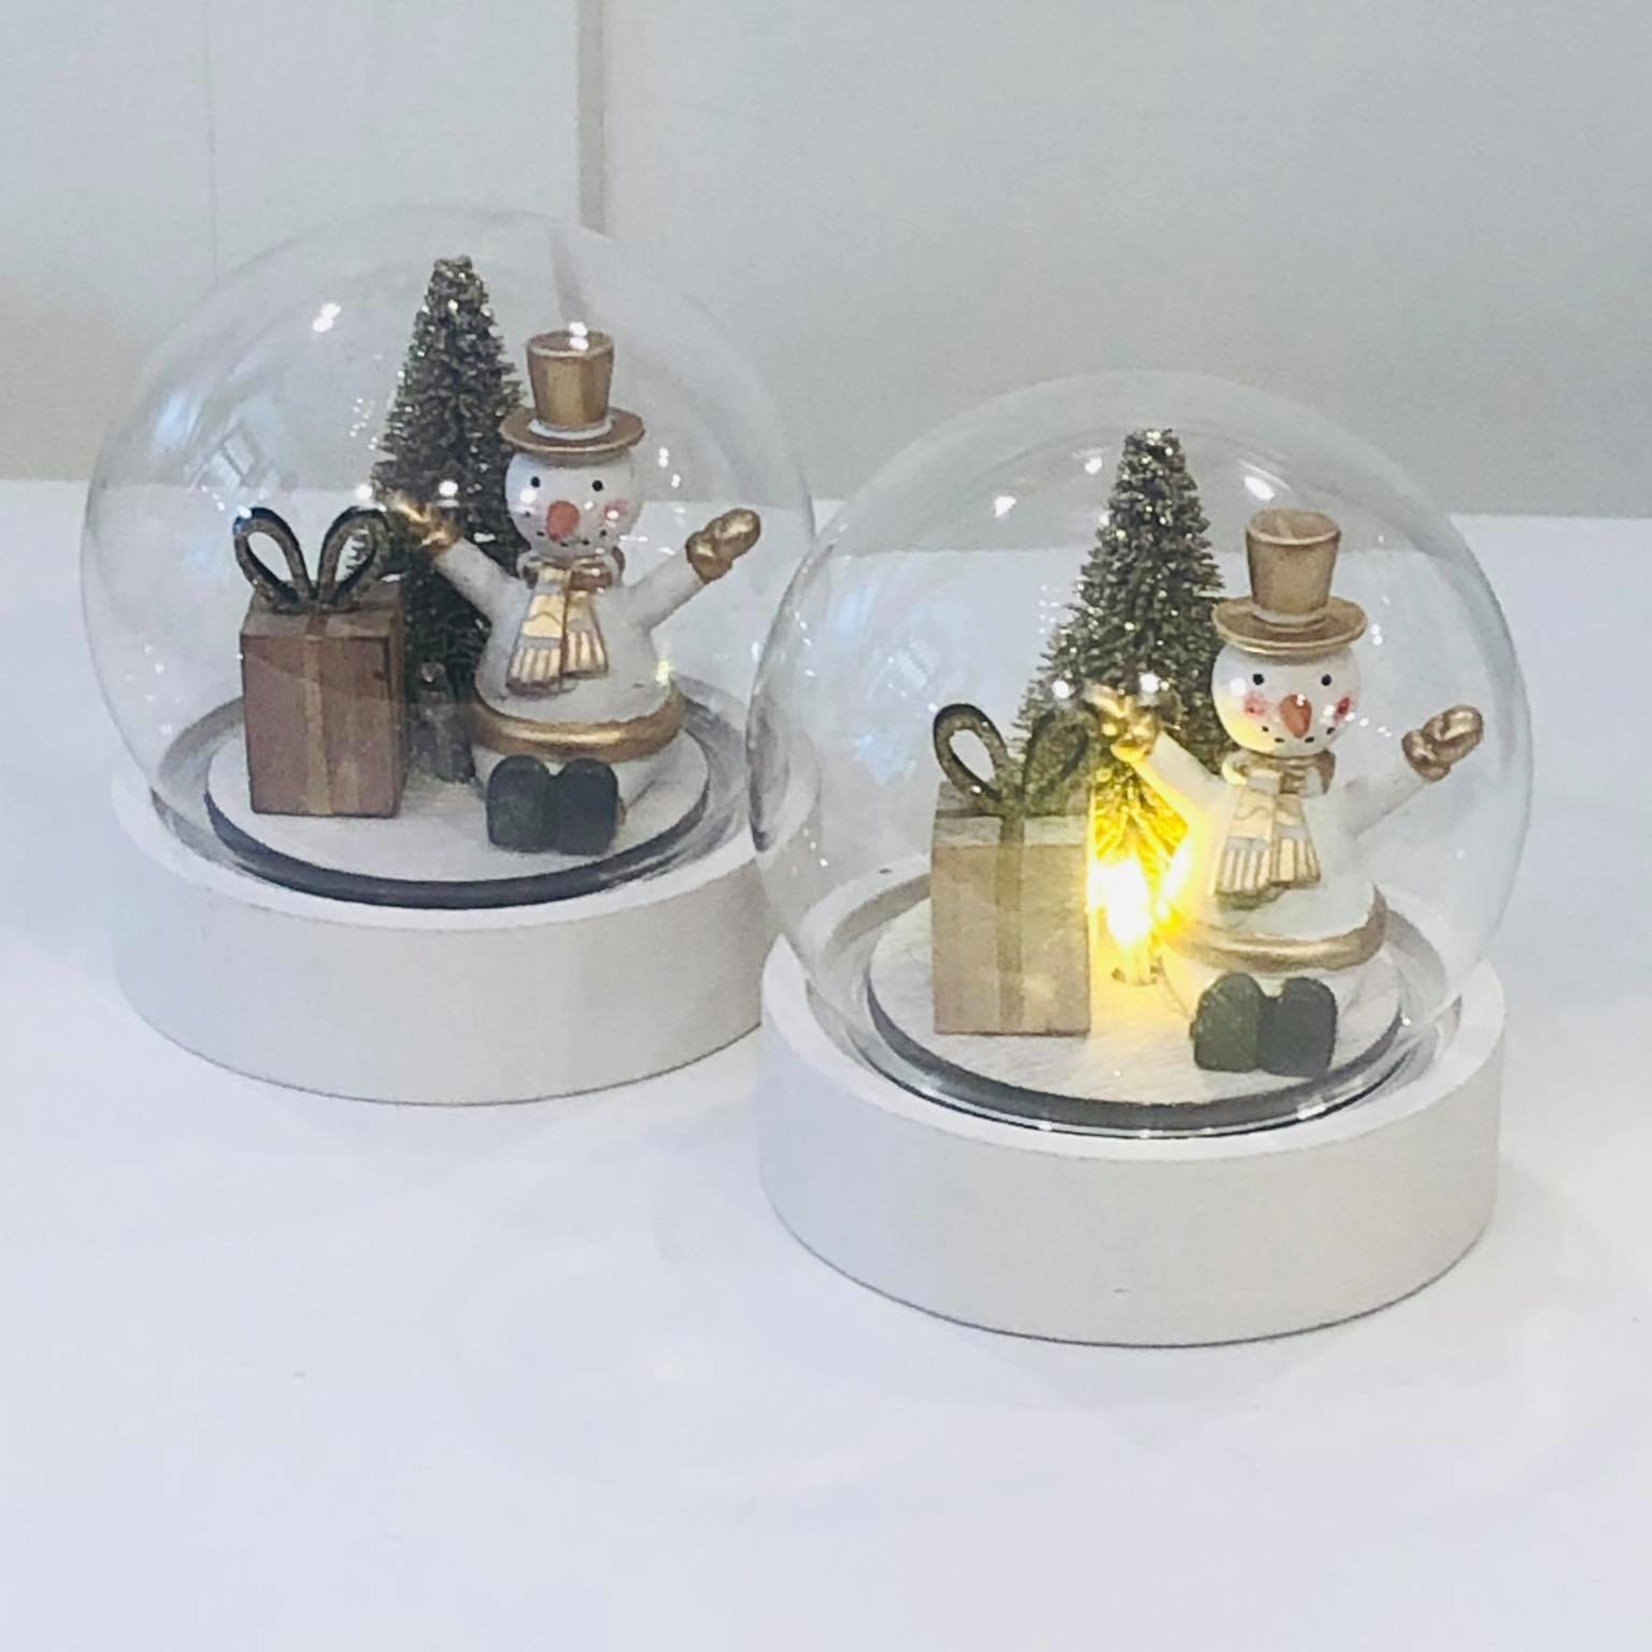 LED globe met sneeuwman - Ø11cm x 10,5cm hoog